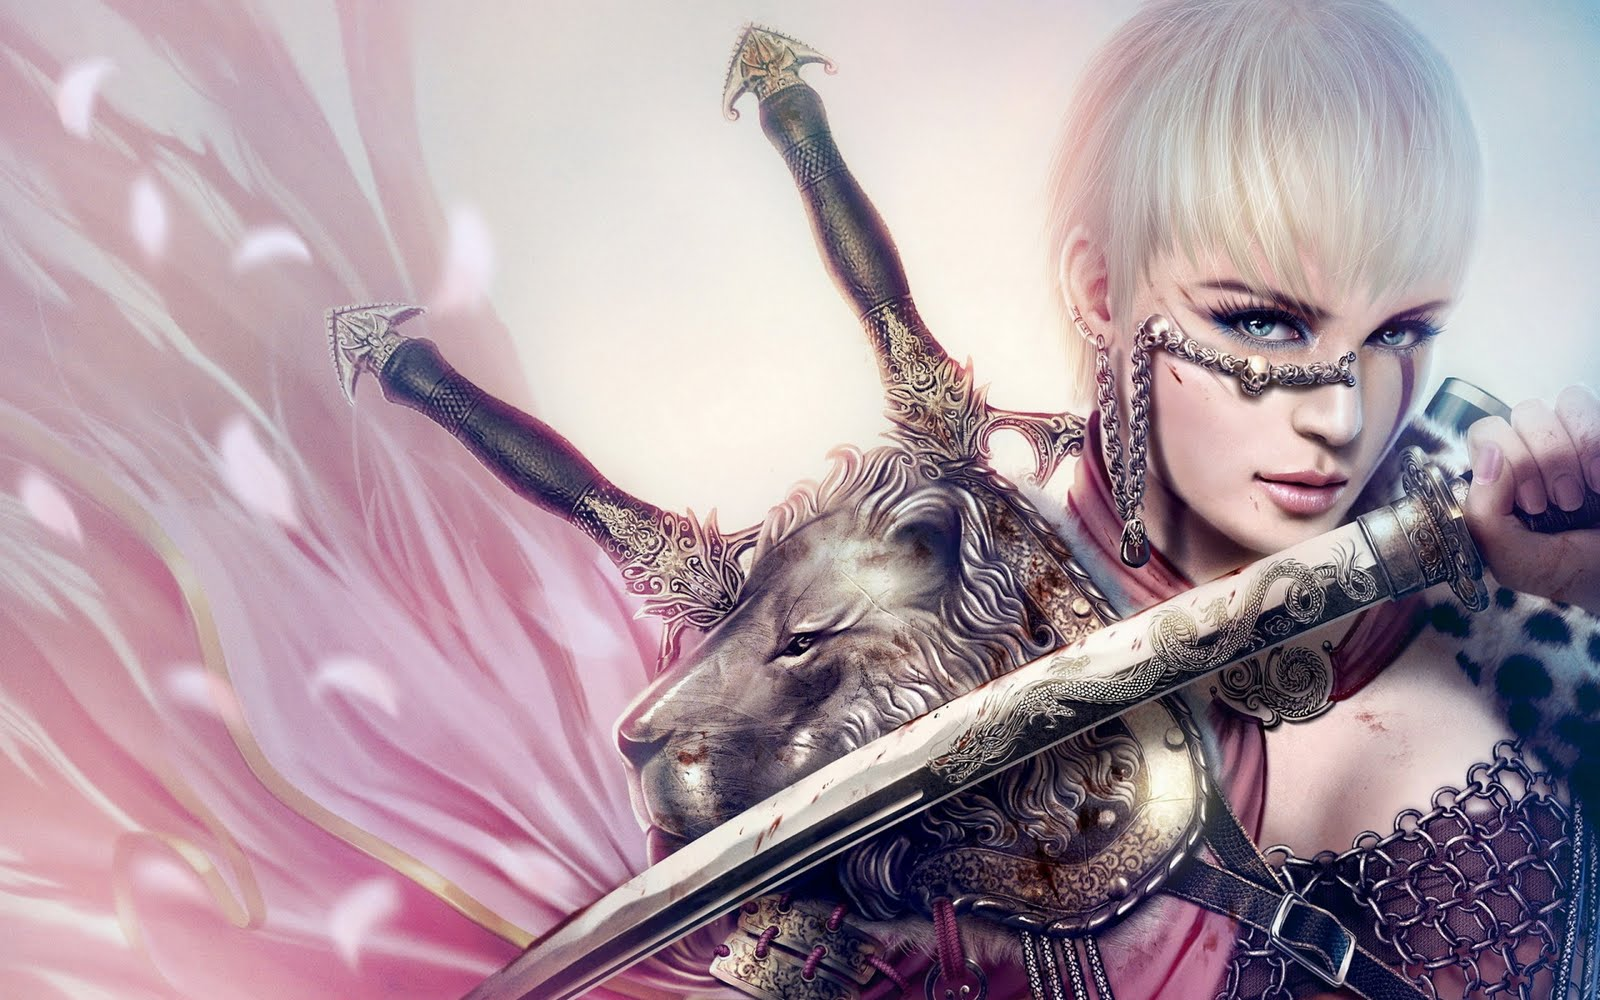 http://4.bp.blogspot.com/-rvEUqFnBKGA/Tmnum0Z_gsI/AAAAAAAACrc/jTfNSFfougg/s1600/Fantasy_Girl_warrior_030812_.jpg